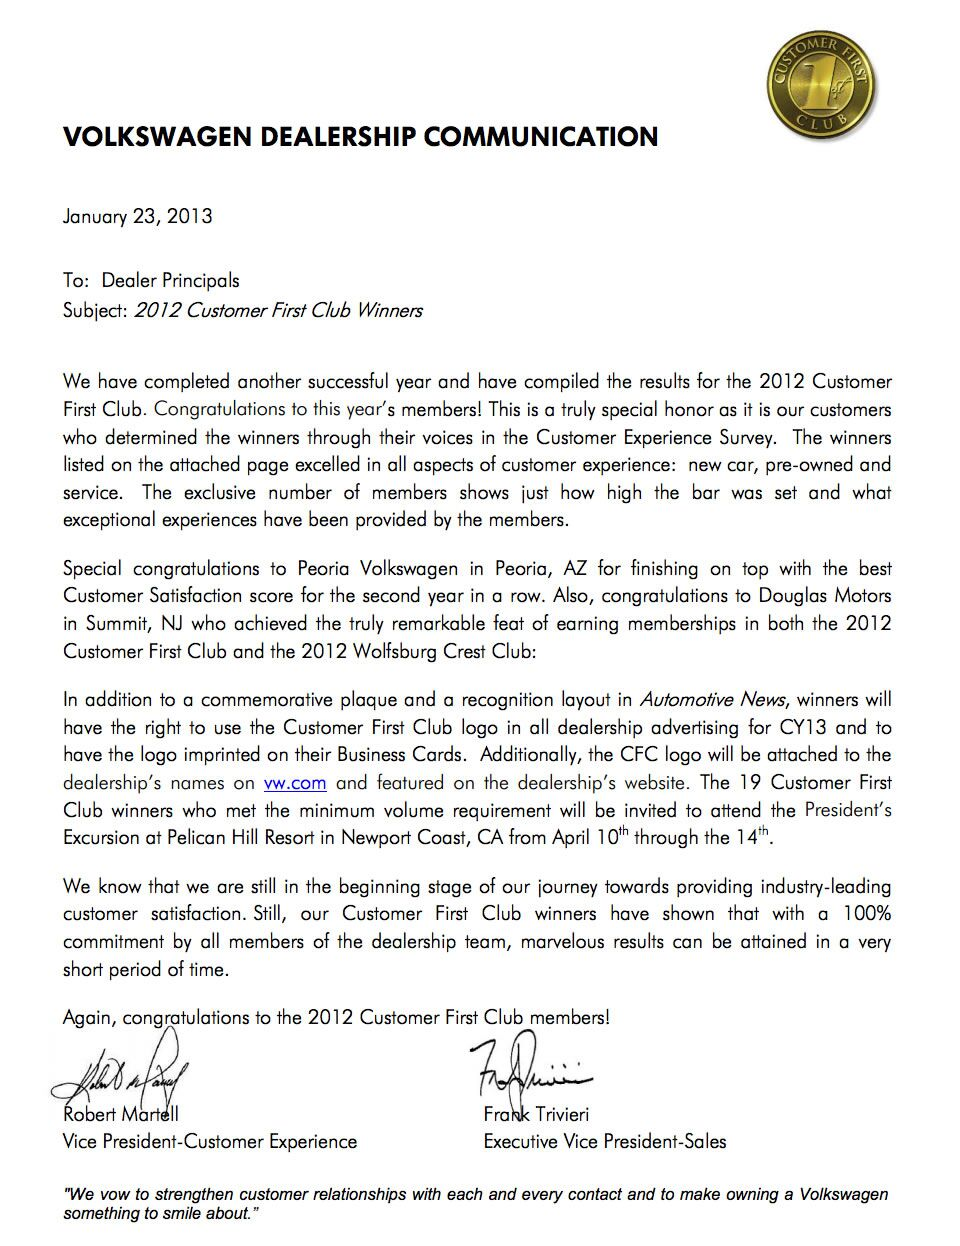 Wellesley Volkswagen Customer First Club Wellesley MA